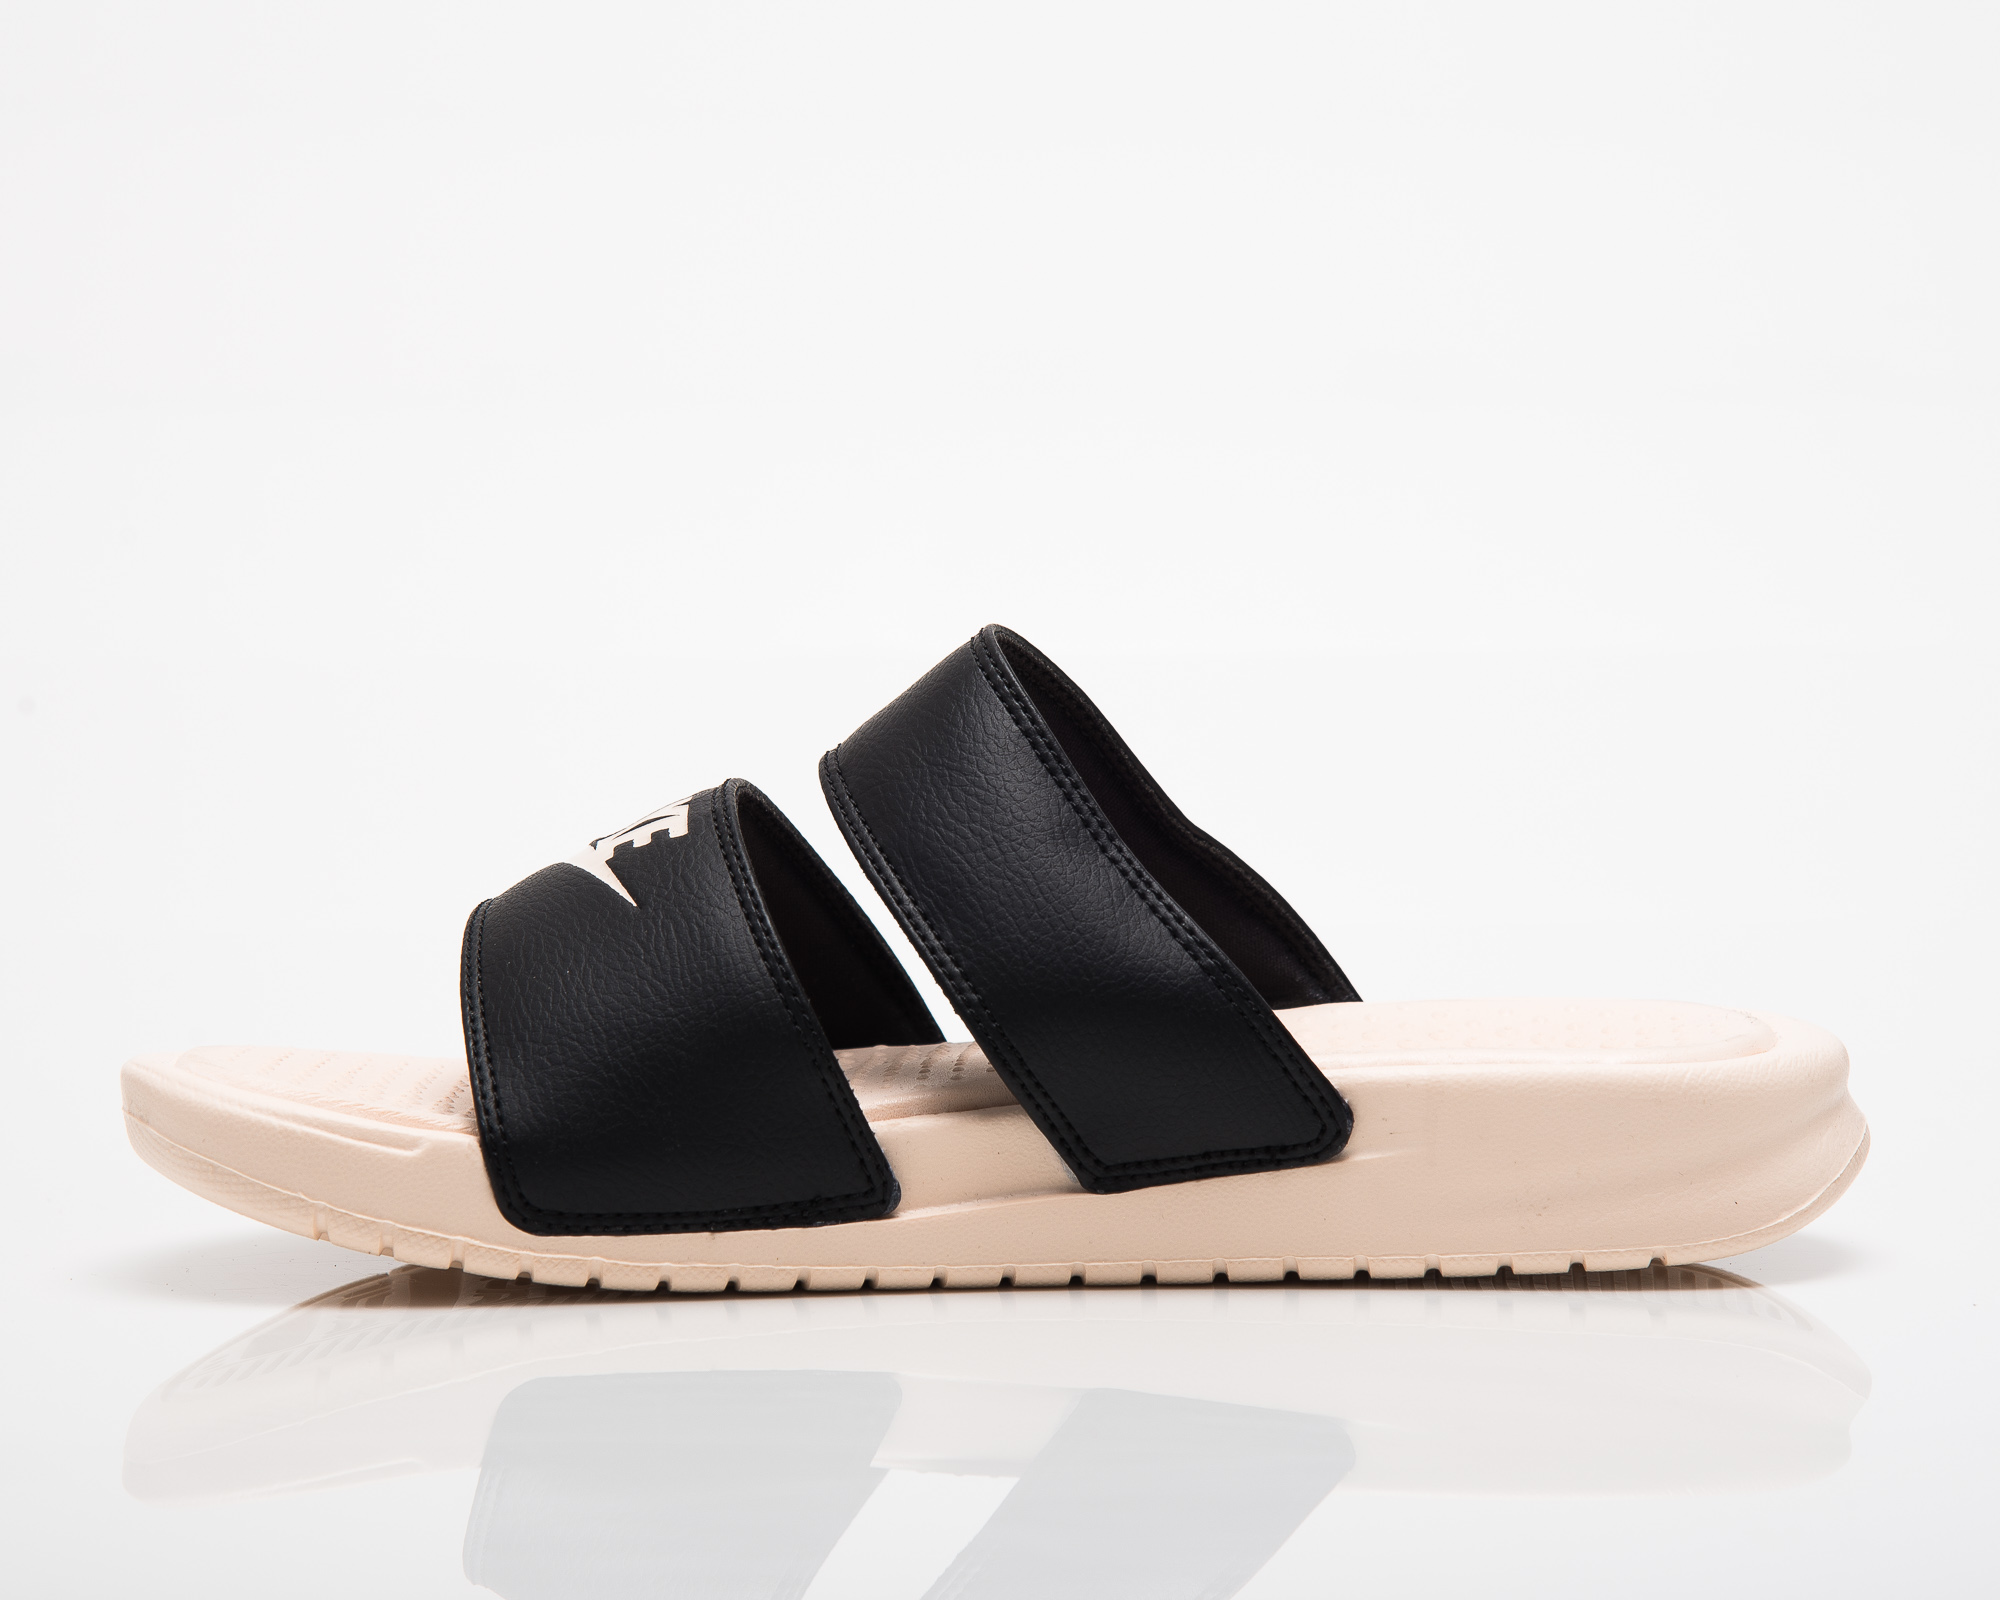 fa1dea0b8ac Nike Wmns Benassi Duo Ultra Slide - Shoes Slides - Sporting goods ...